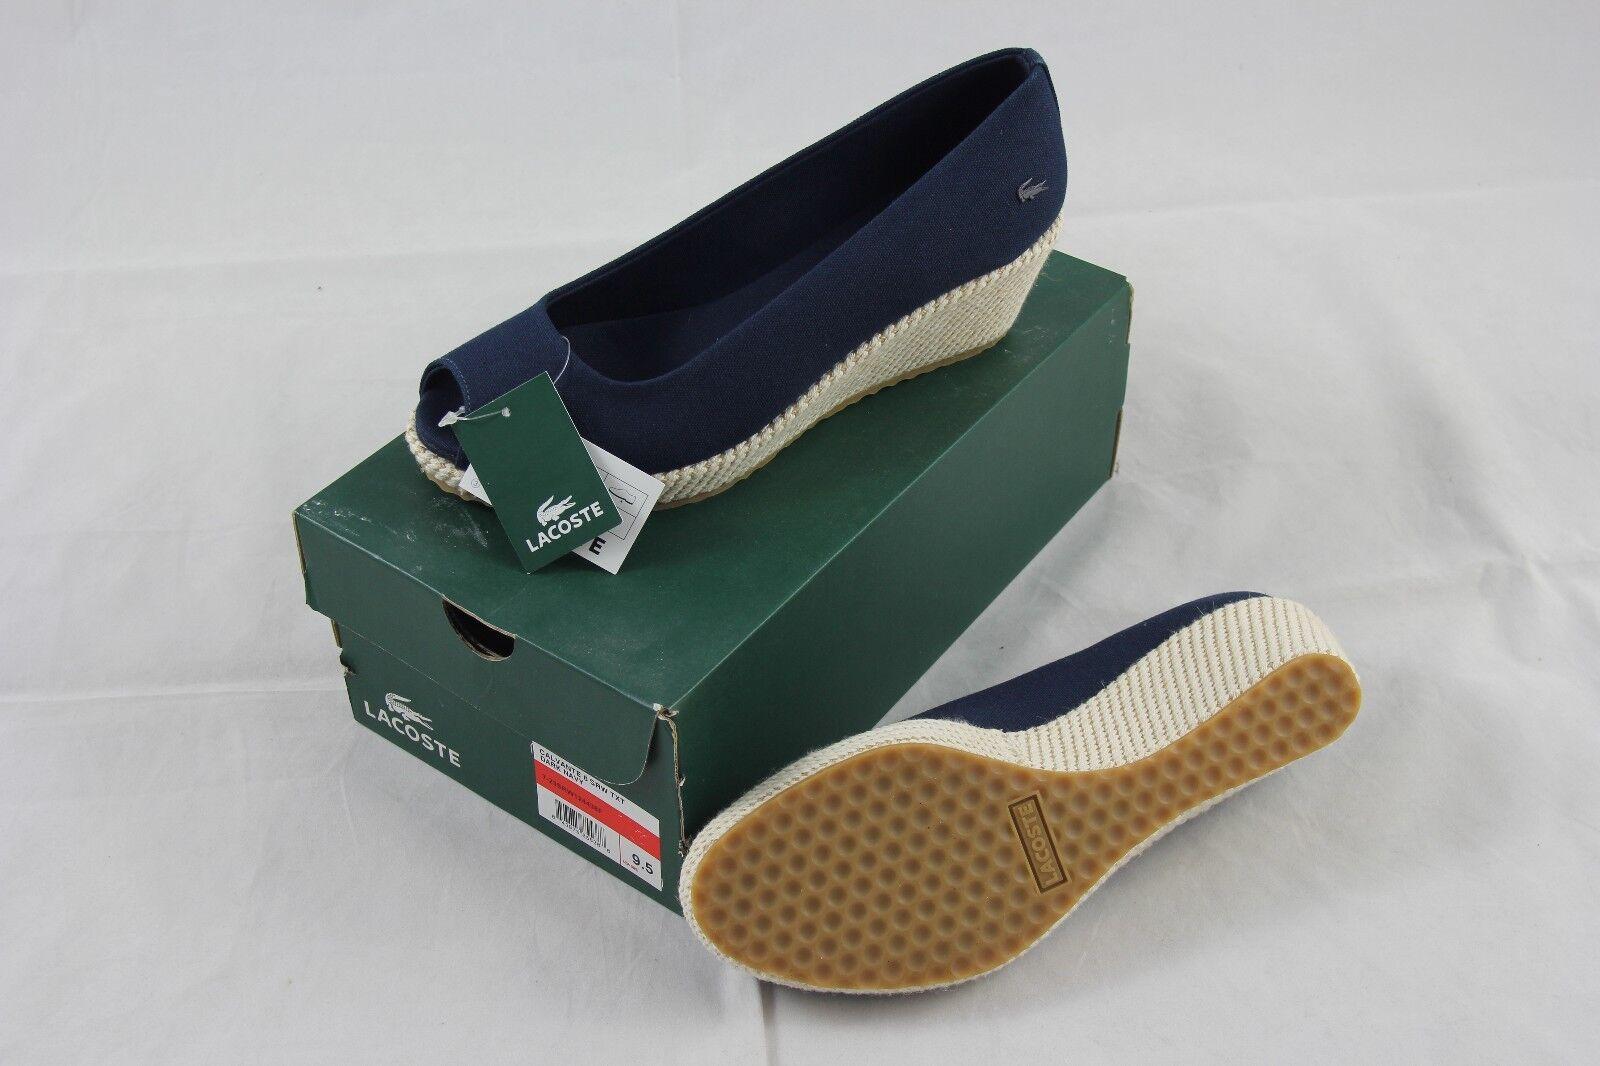 BNIB Lacoste  Calvante  Azul Marino Oscuro textiles Slip-on Slip-on Slip-on medio Tacones Talla 9.5  online al mejor precio